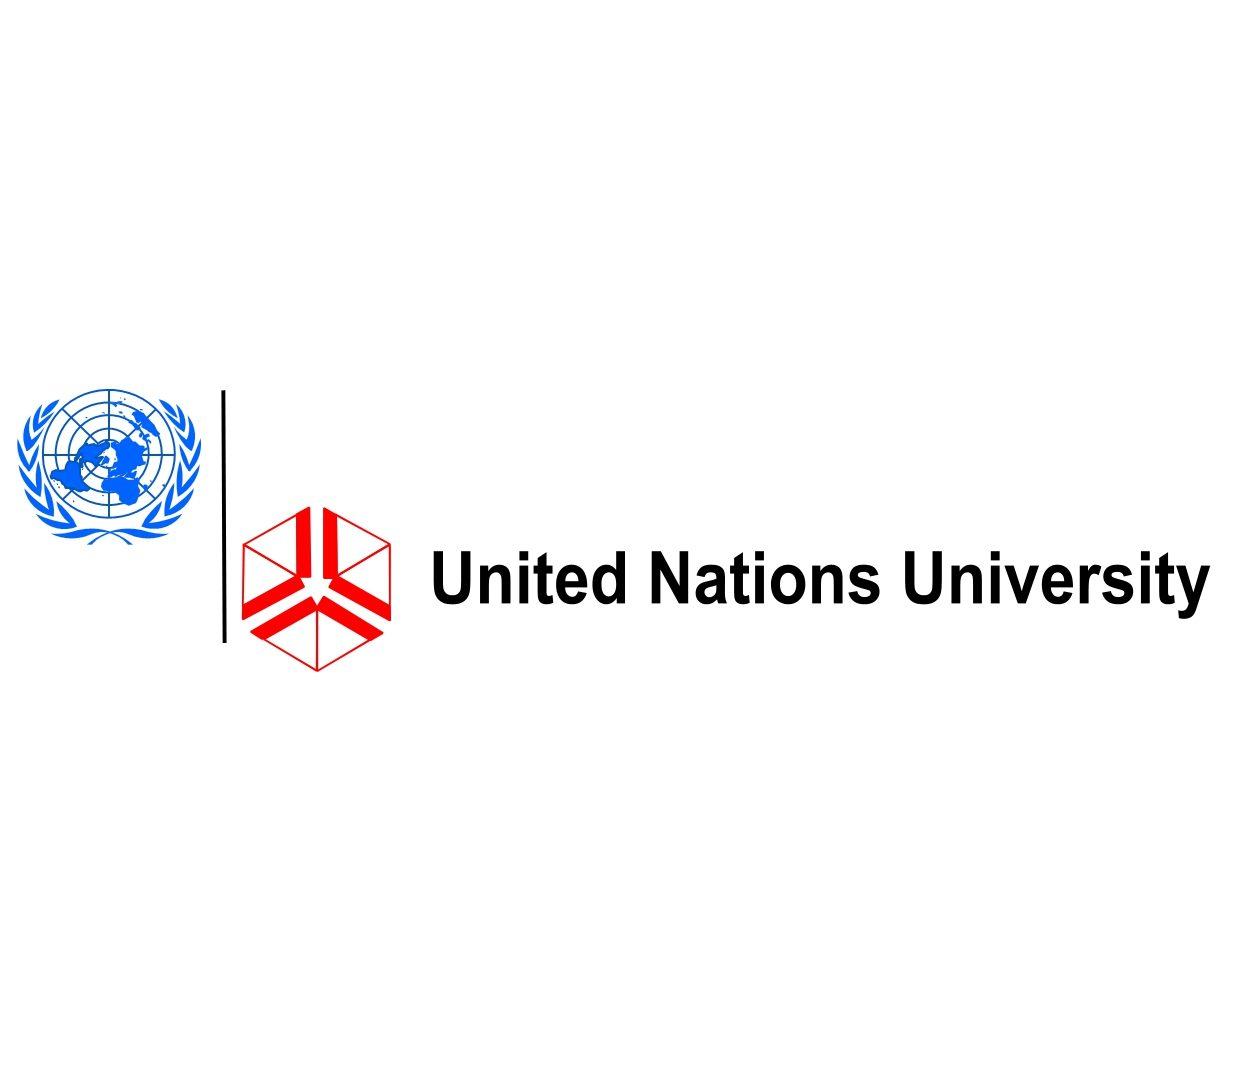 Japan Foundation United Nations University PhD Scholarships 2019